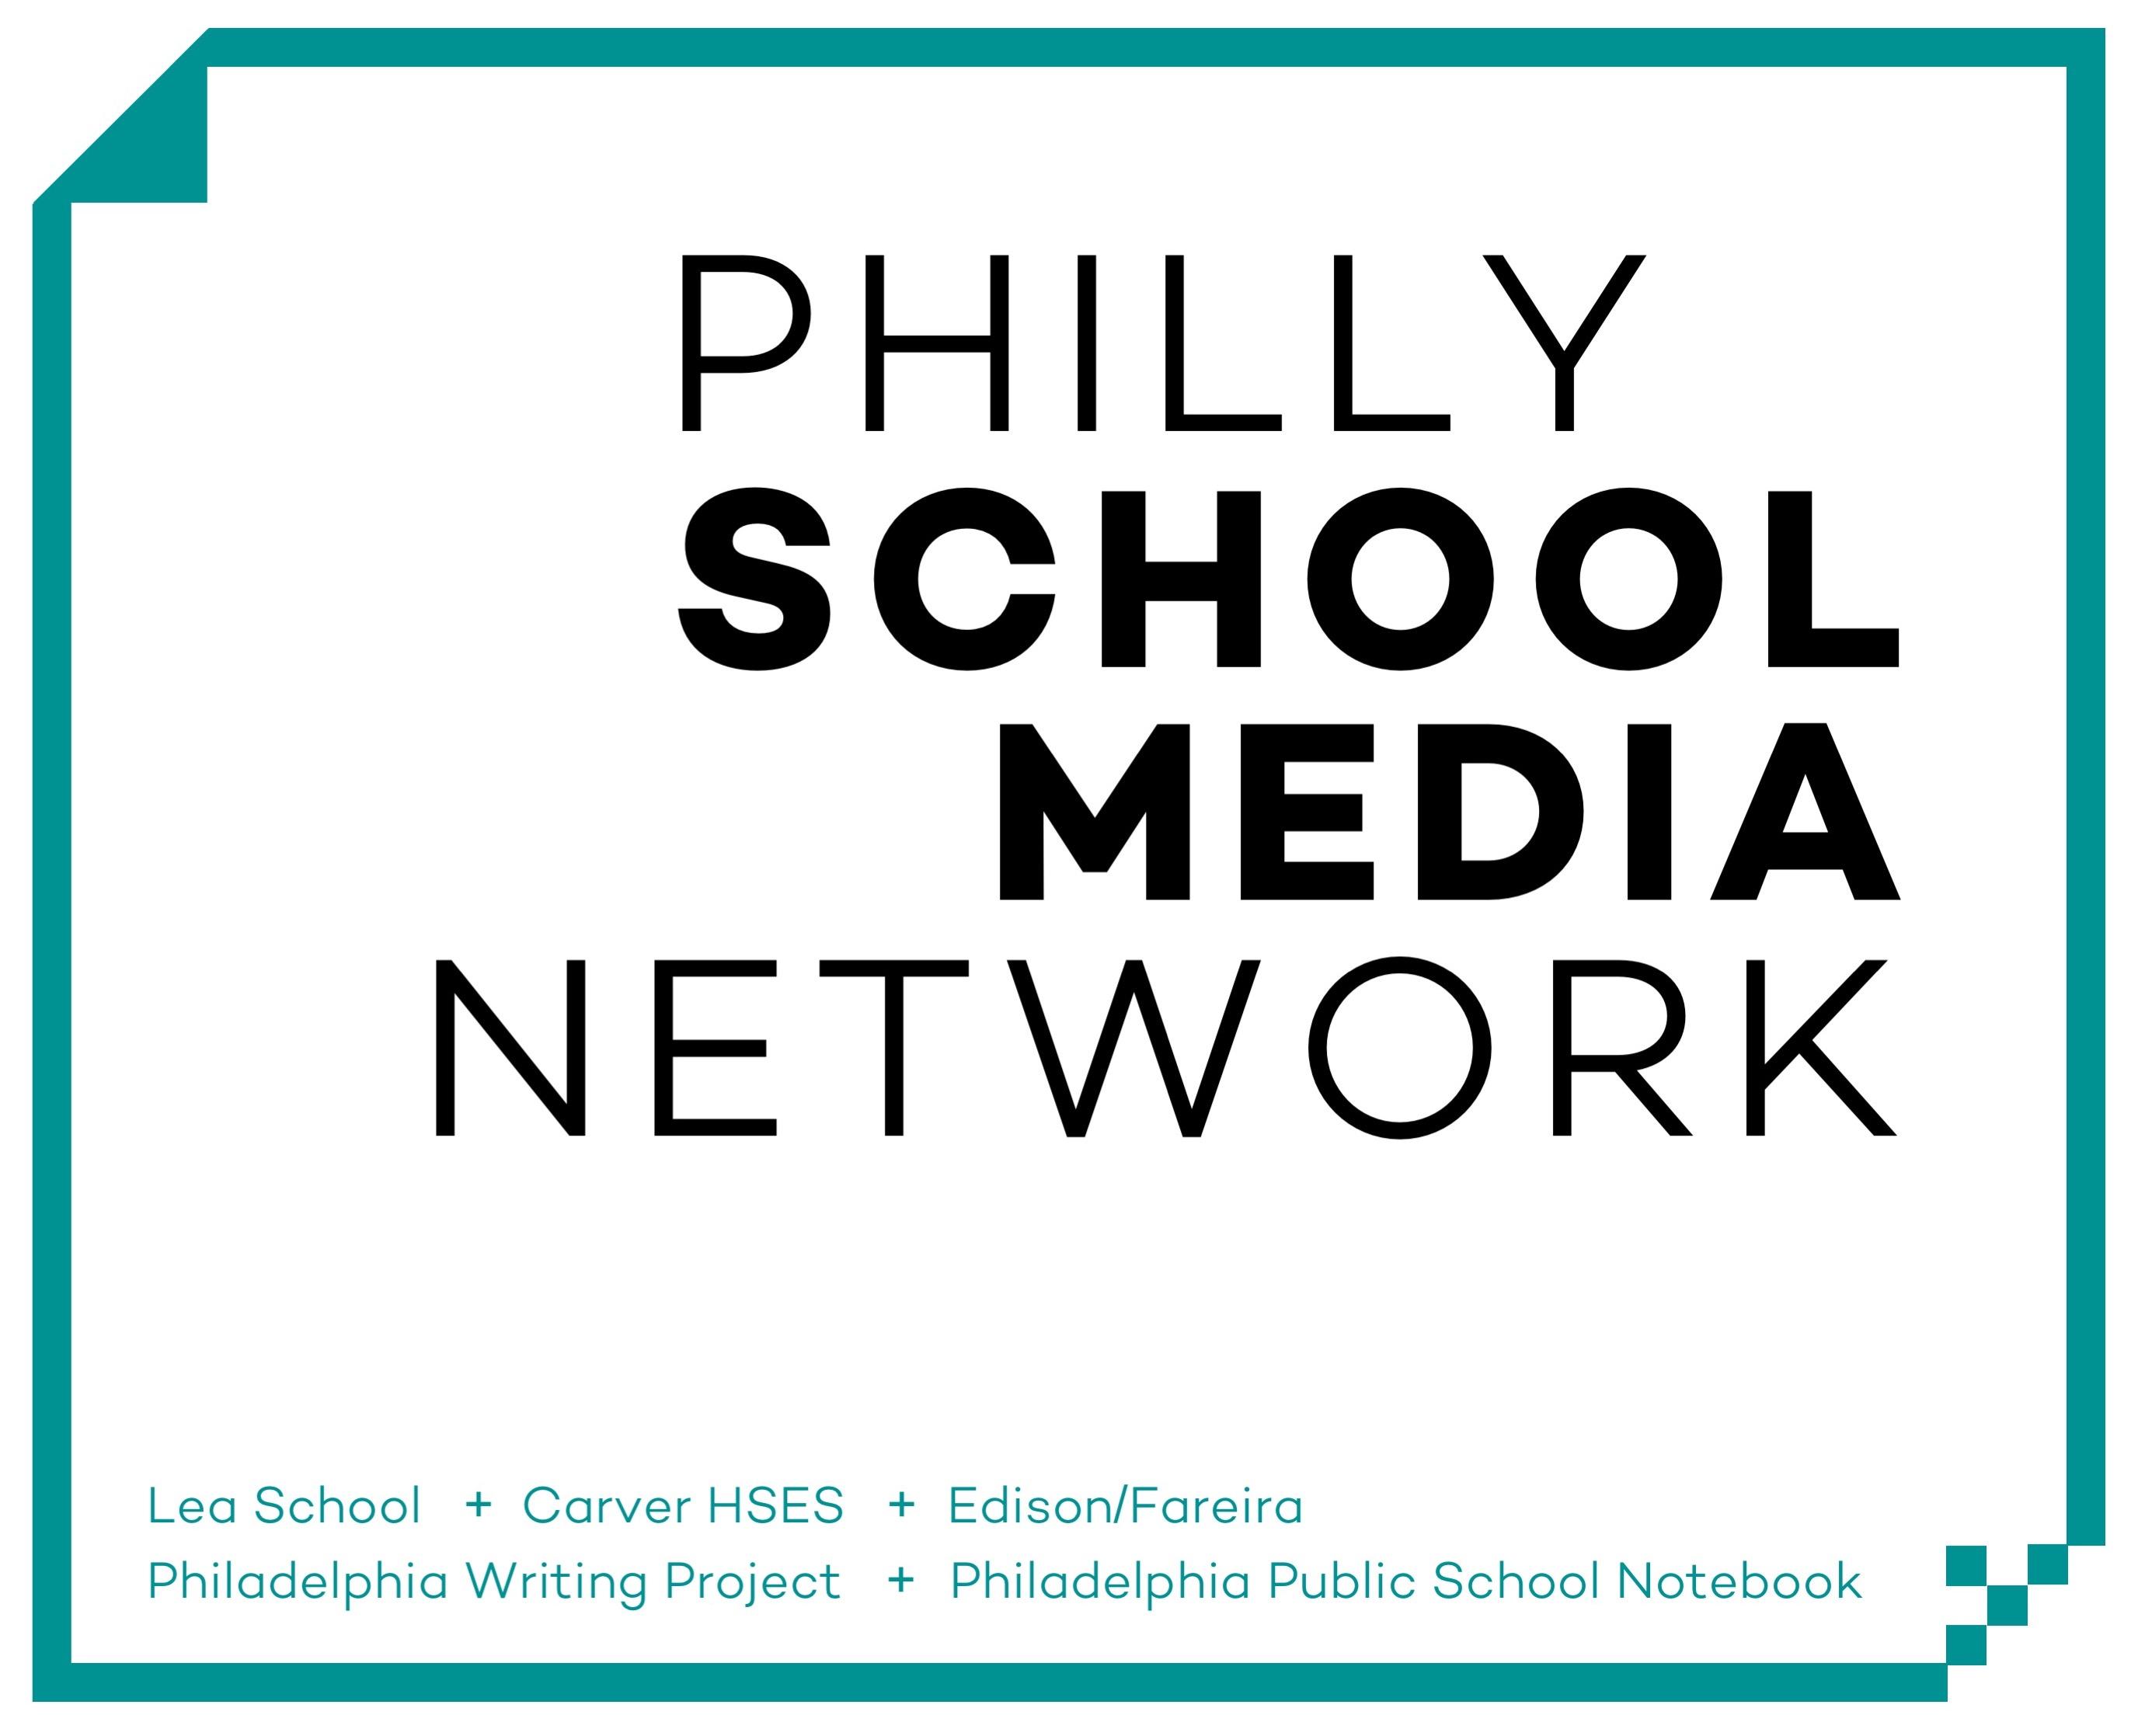 Philly School Media Network: Nurturing Journalism and Student Voices